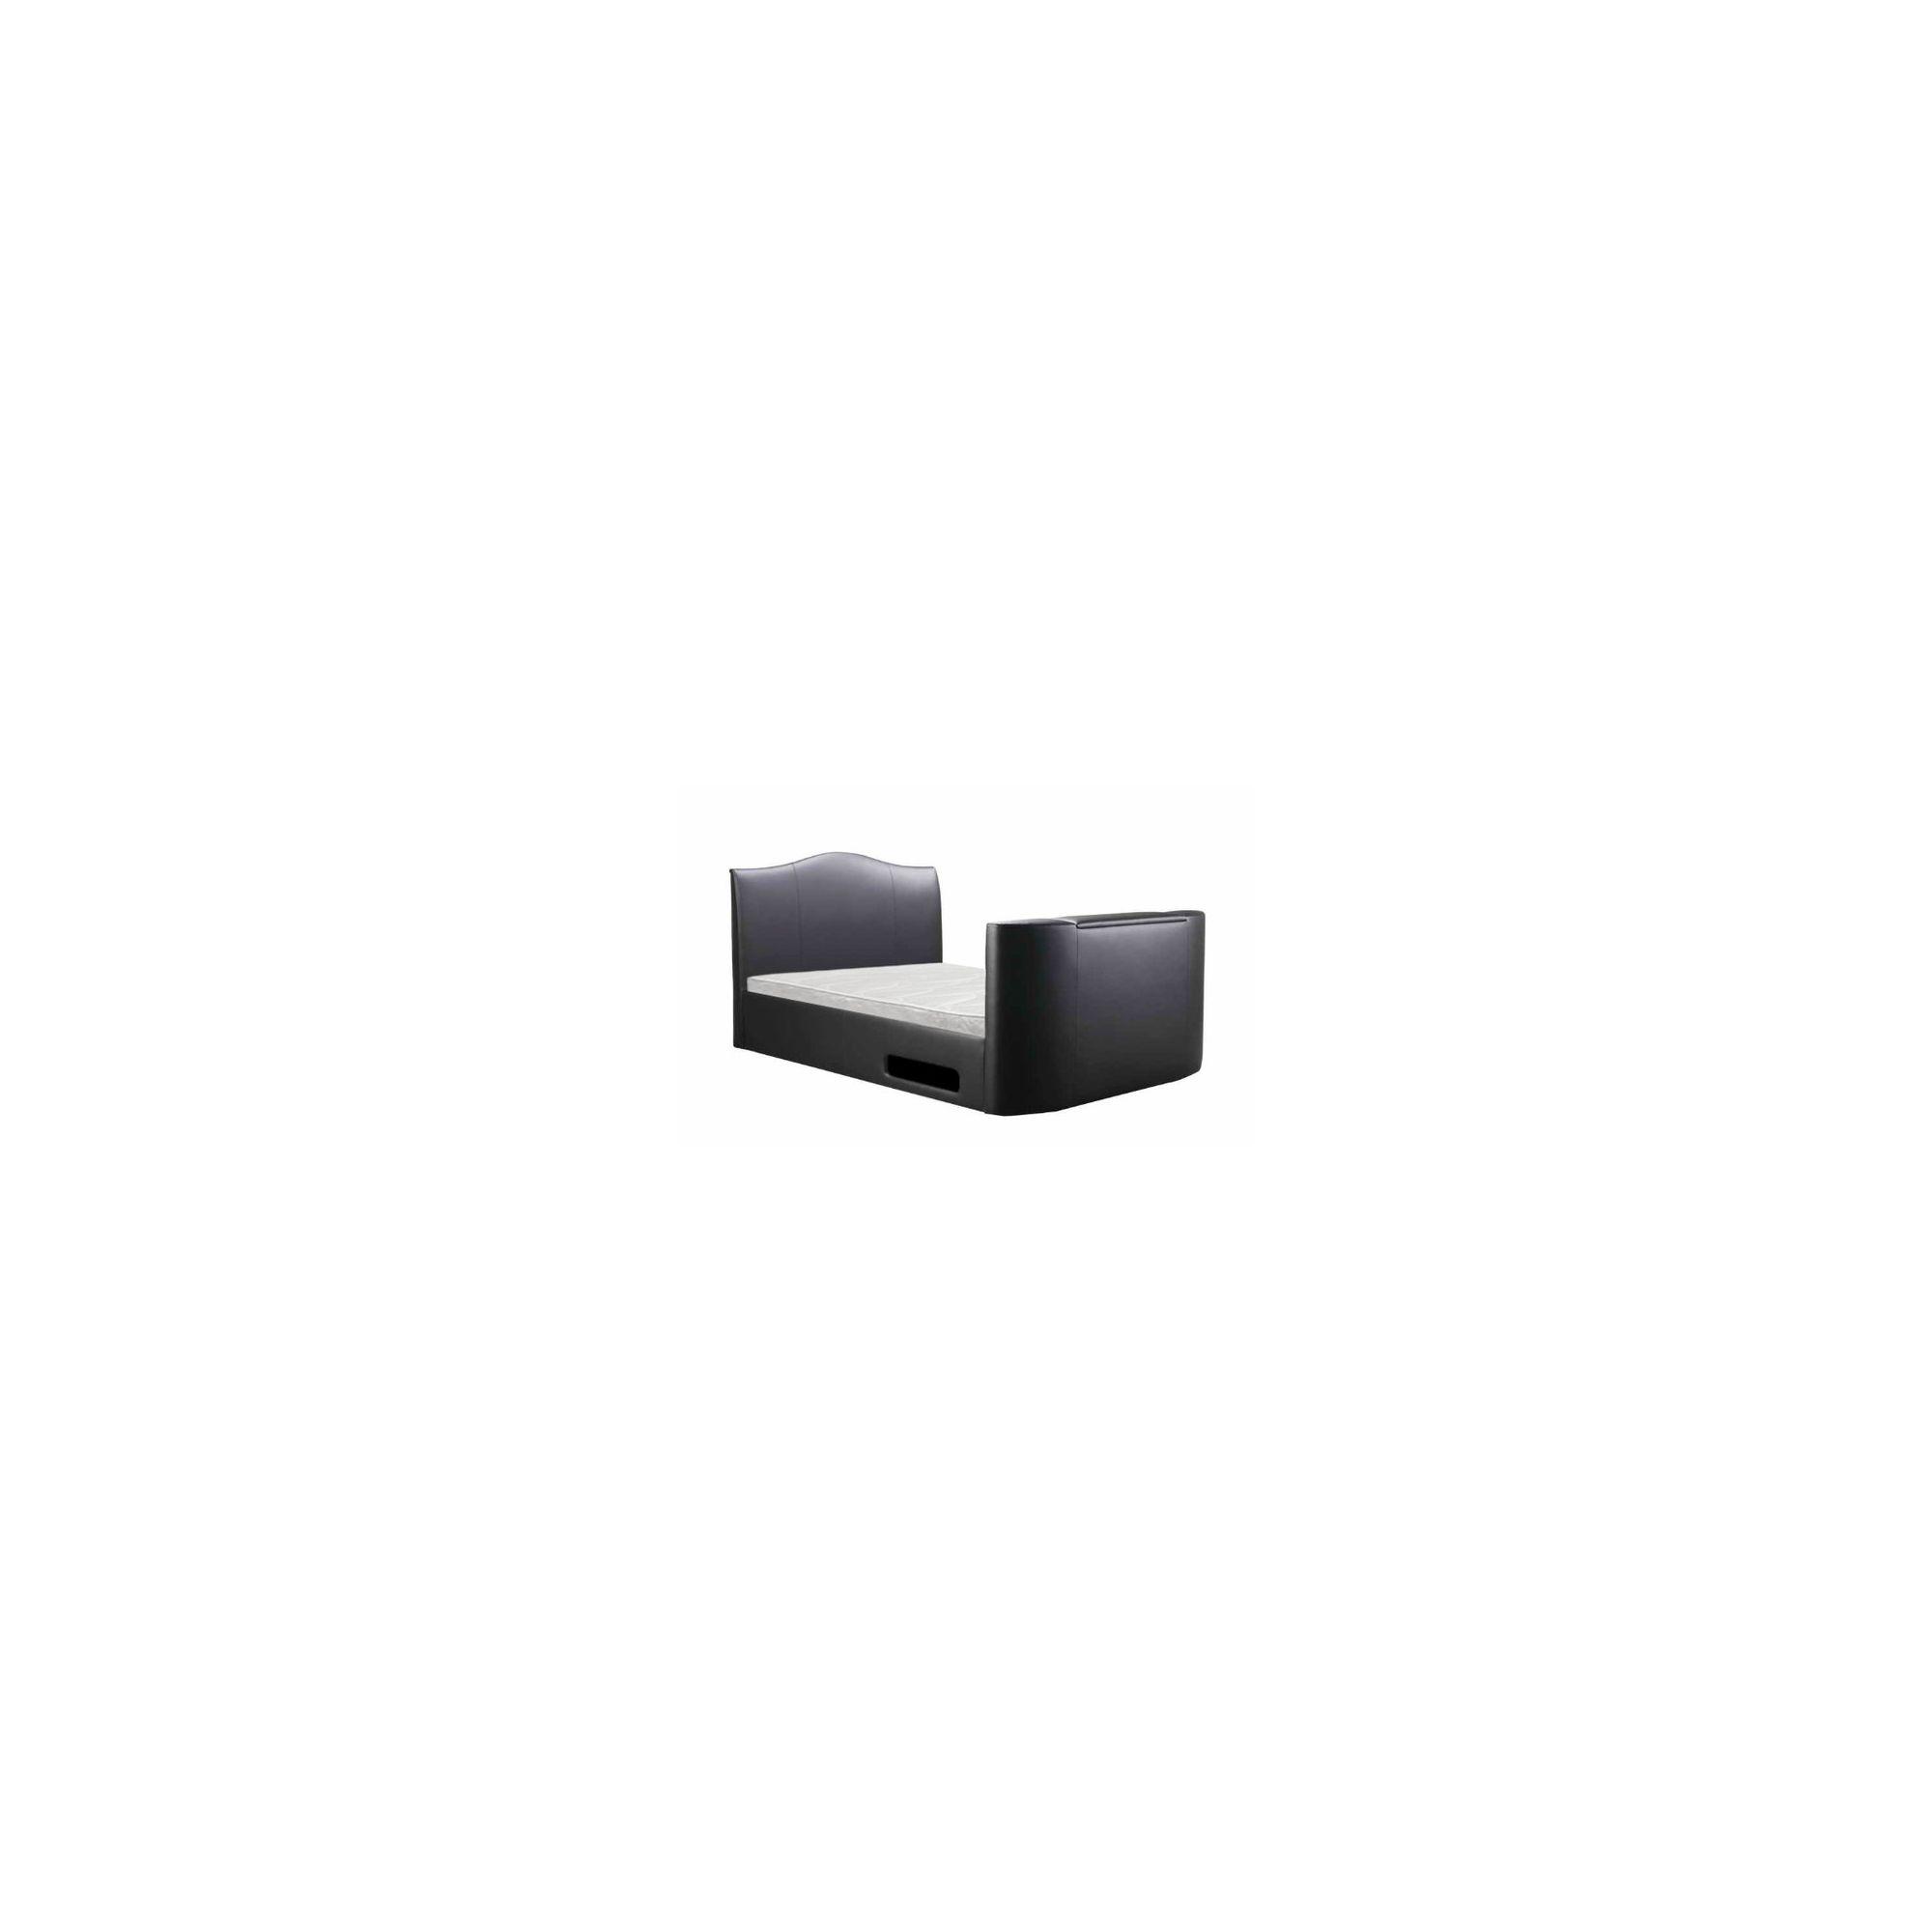 Altruna Amira Electric Wireless TV Bed - Super King at Tesco Direct